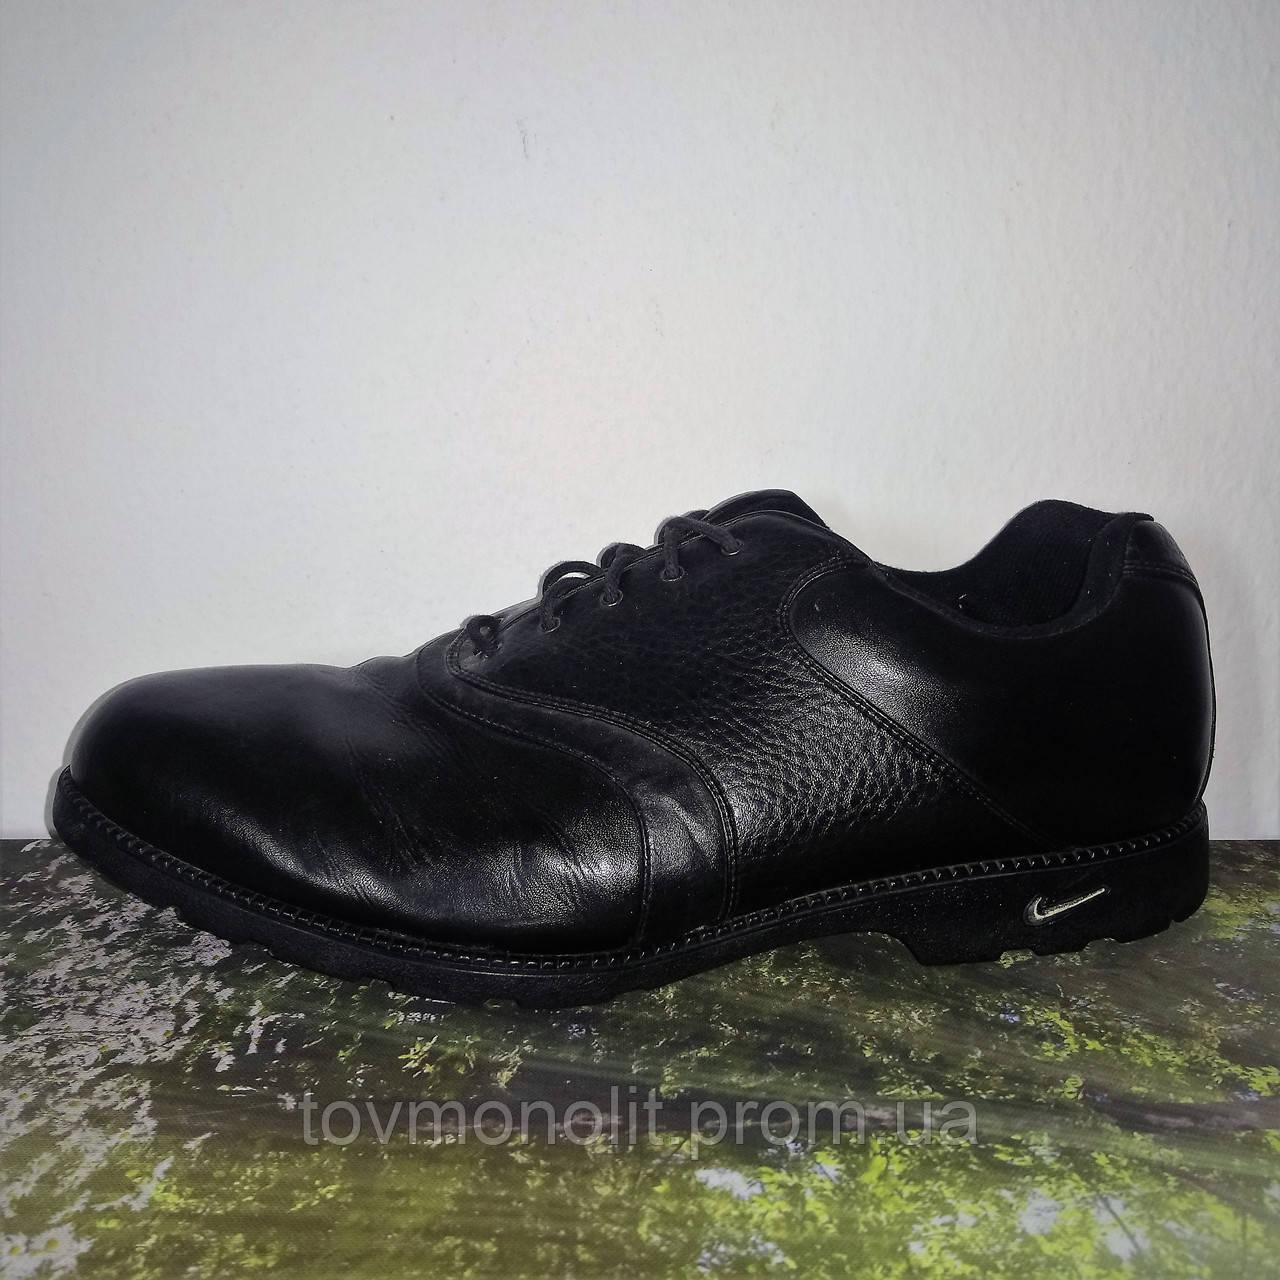 f2d36a5ea7c Туфли мужские спортивные Nike, р.45: продажа, цена в Києві. туфлі ...